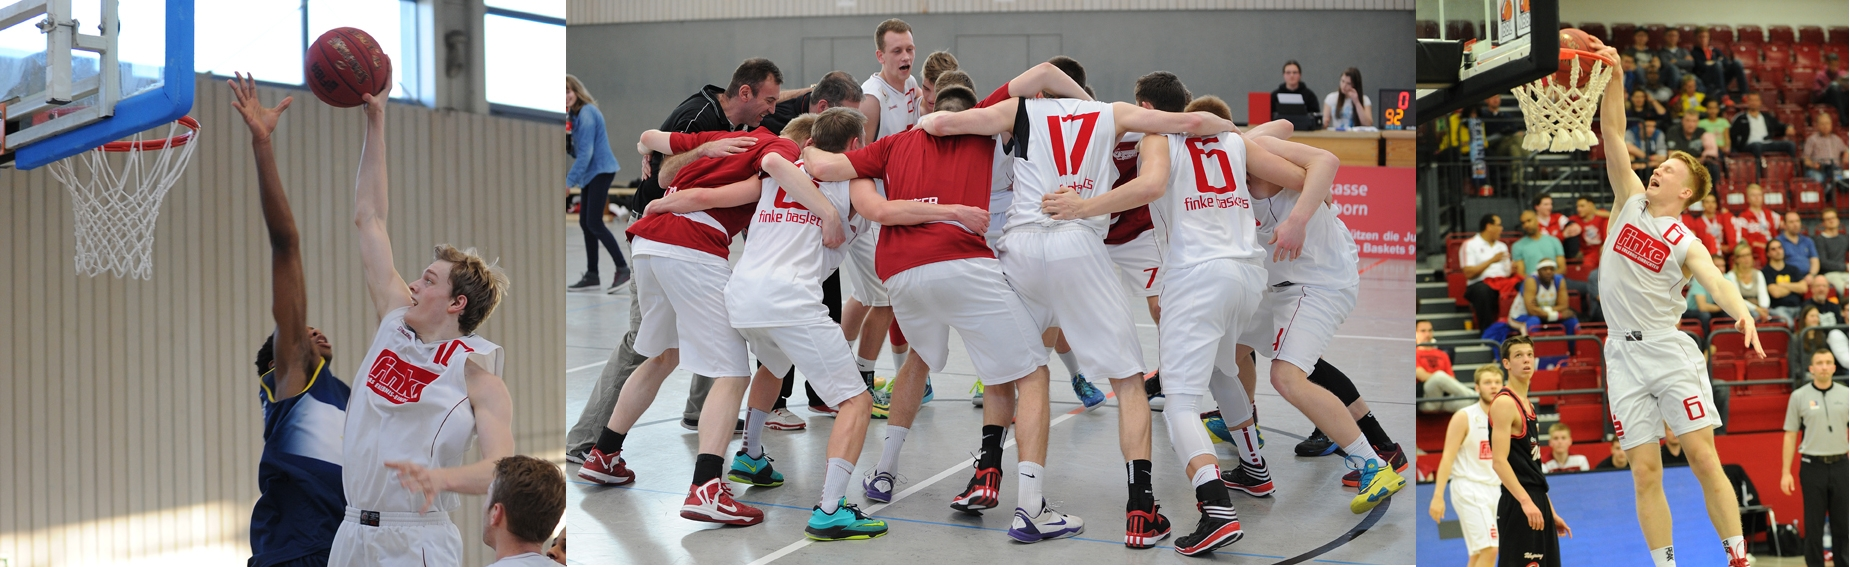 Jugendteams